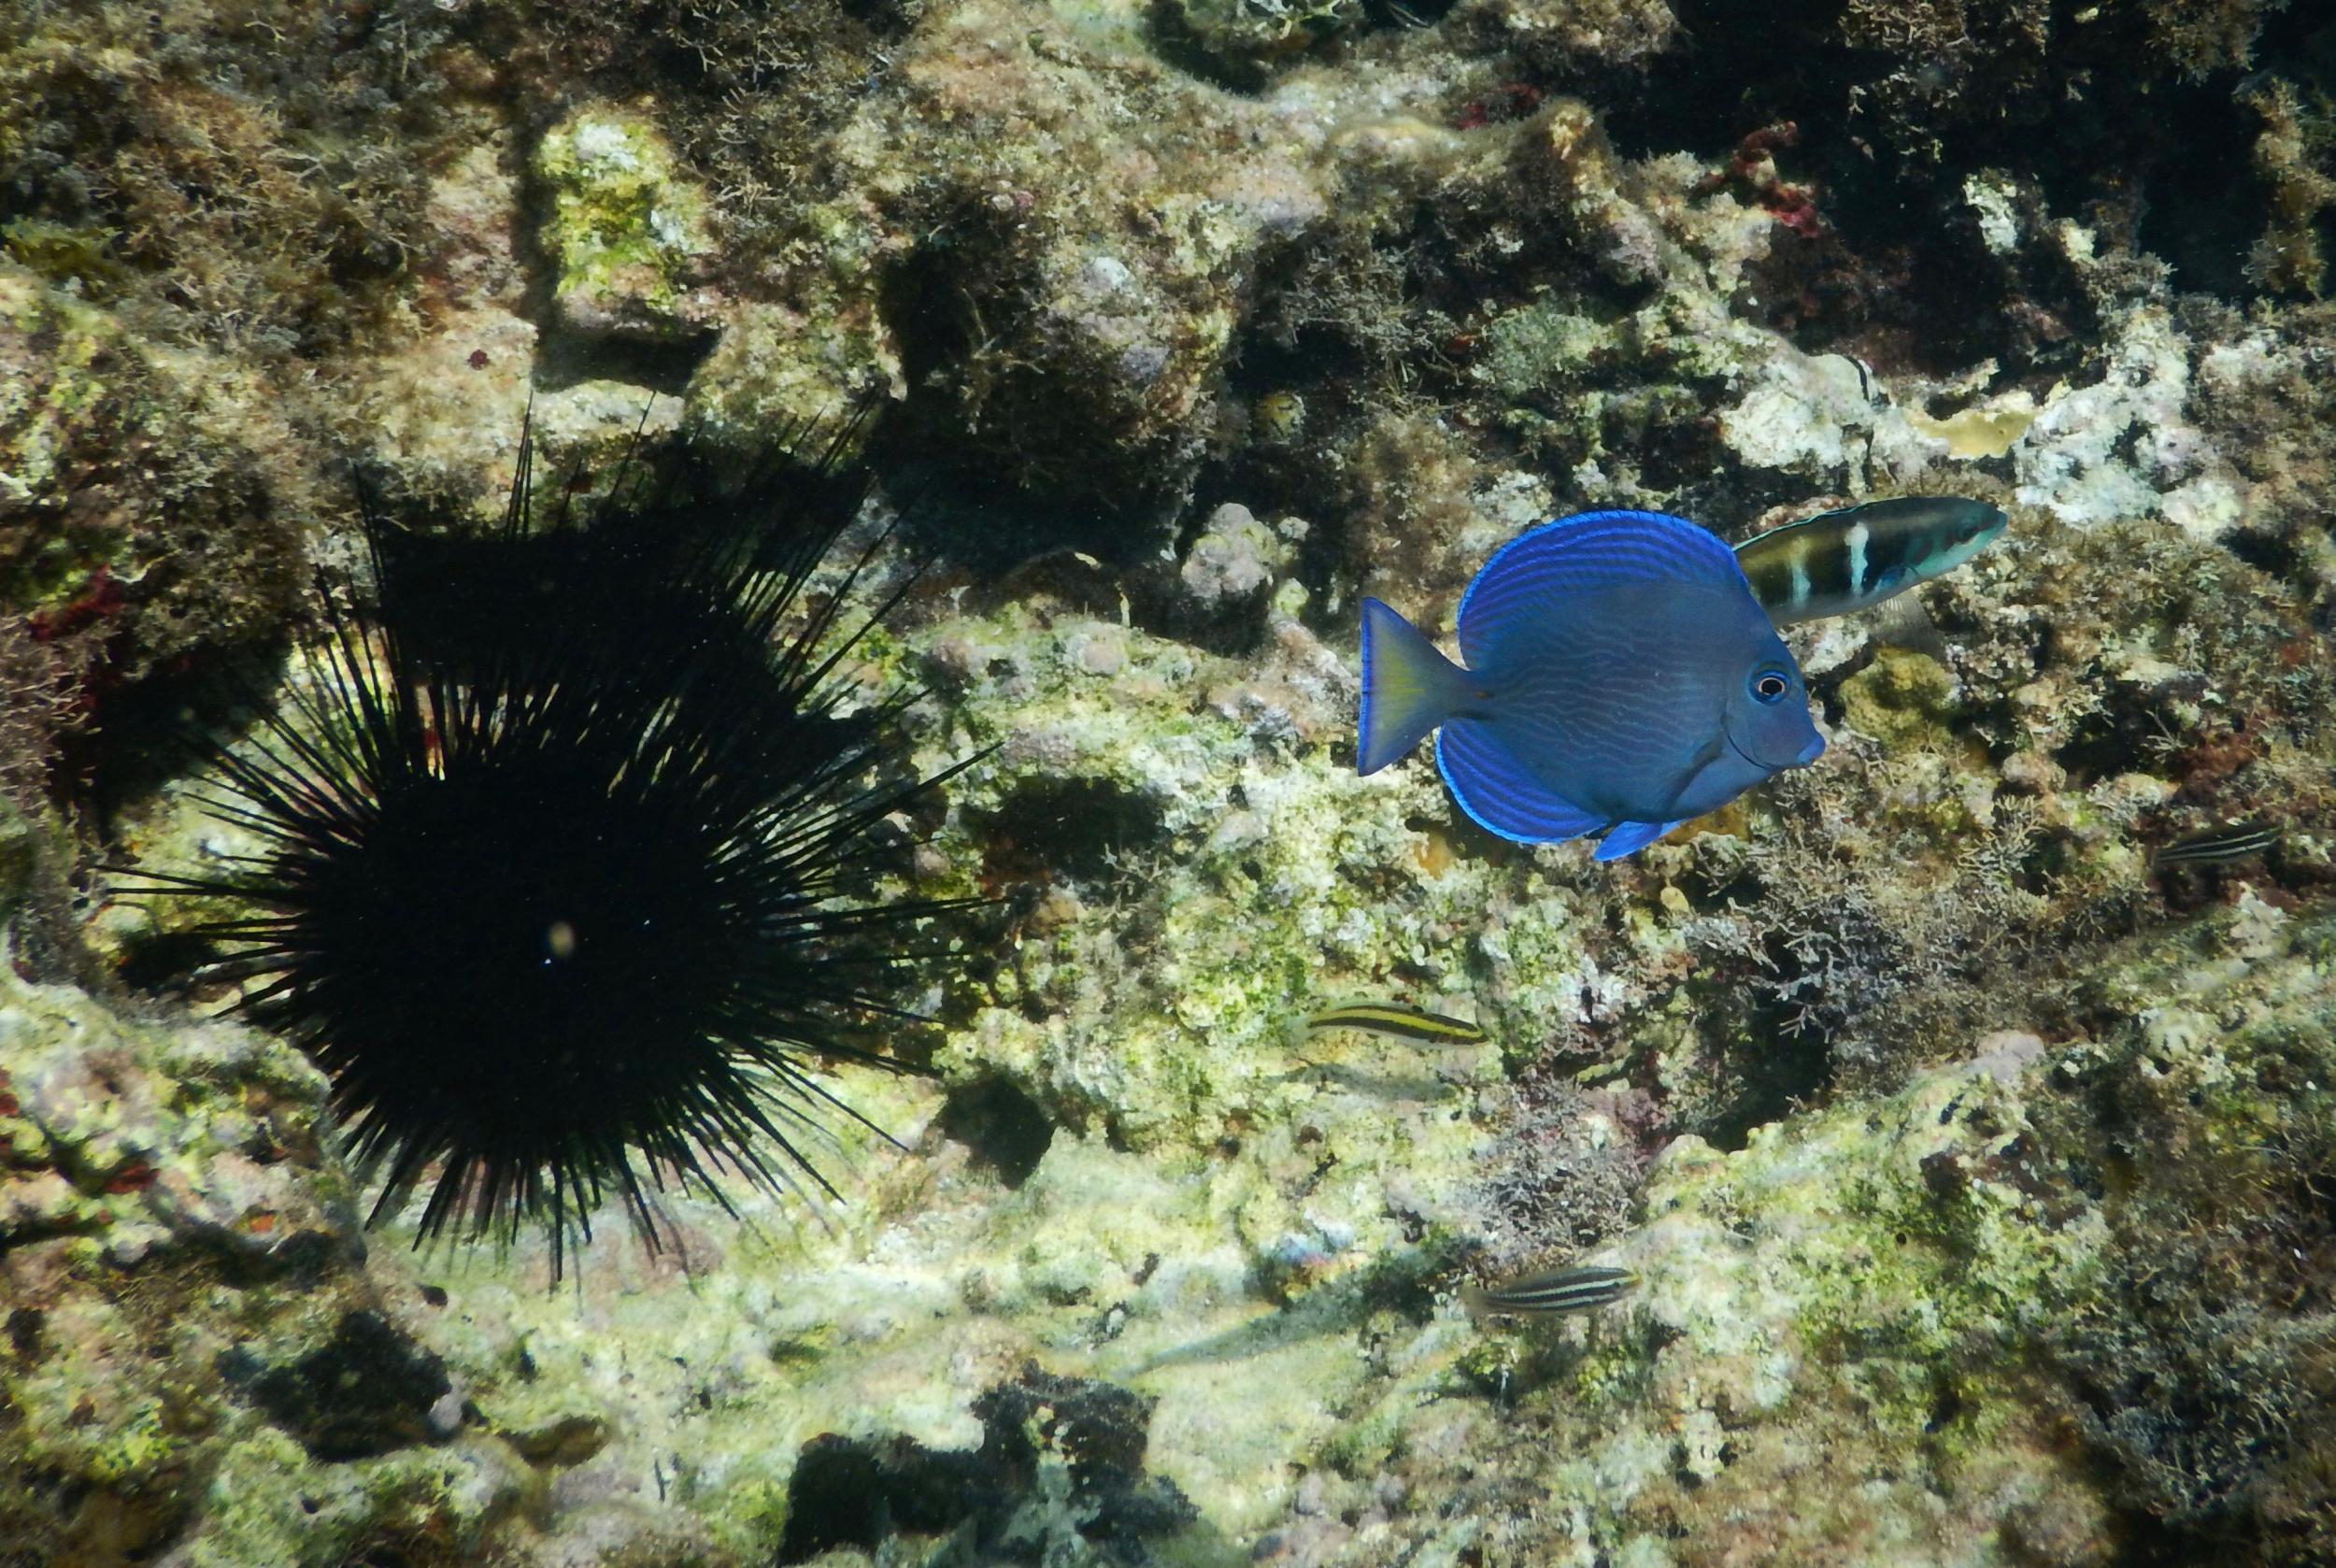 60. Under the sea